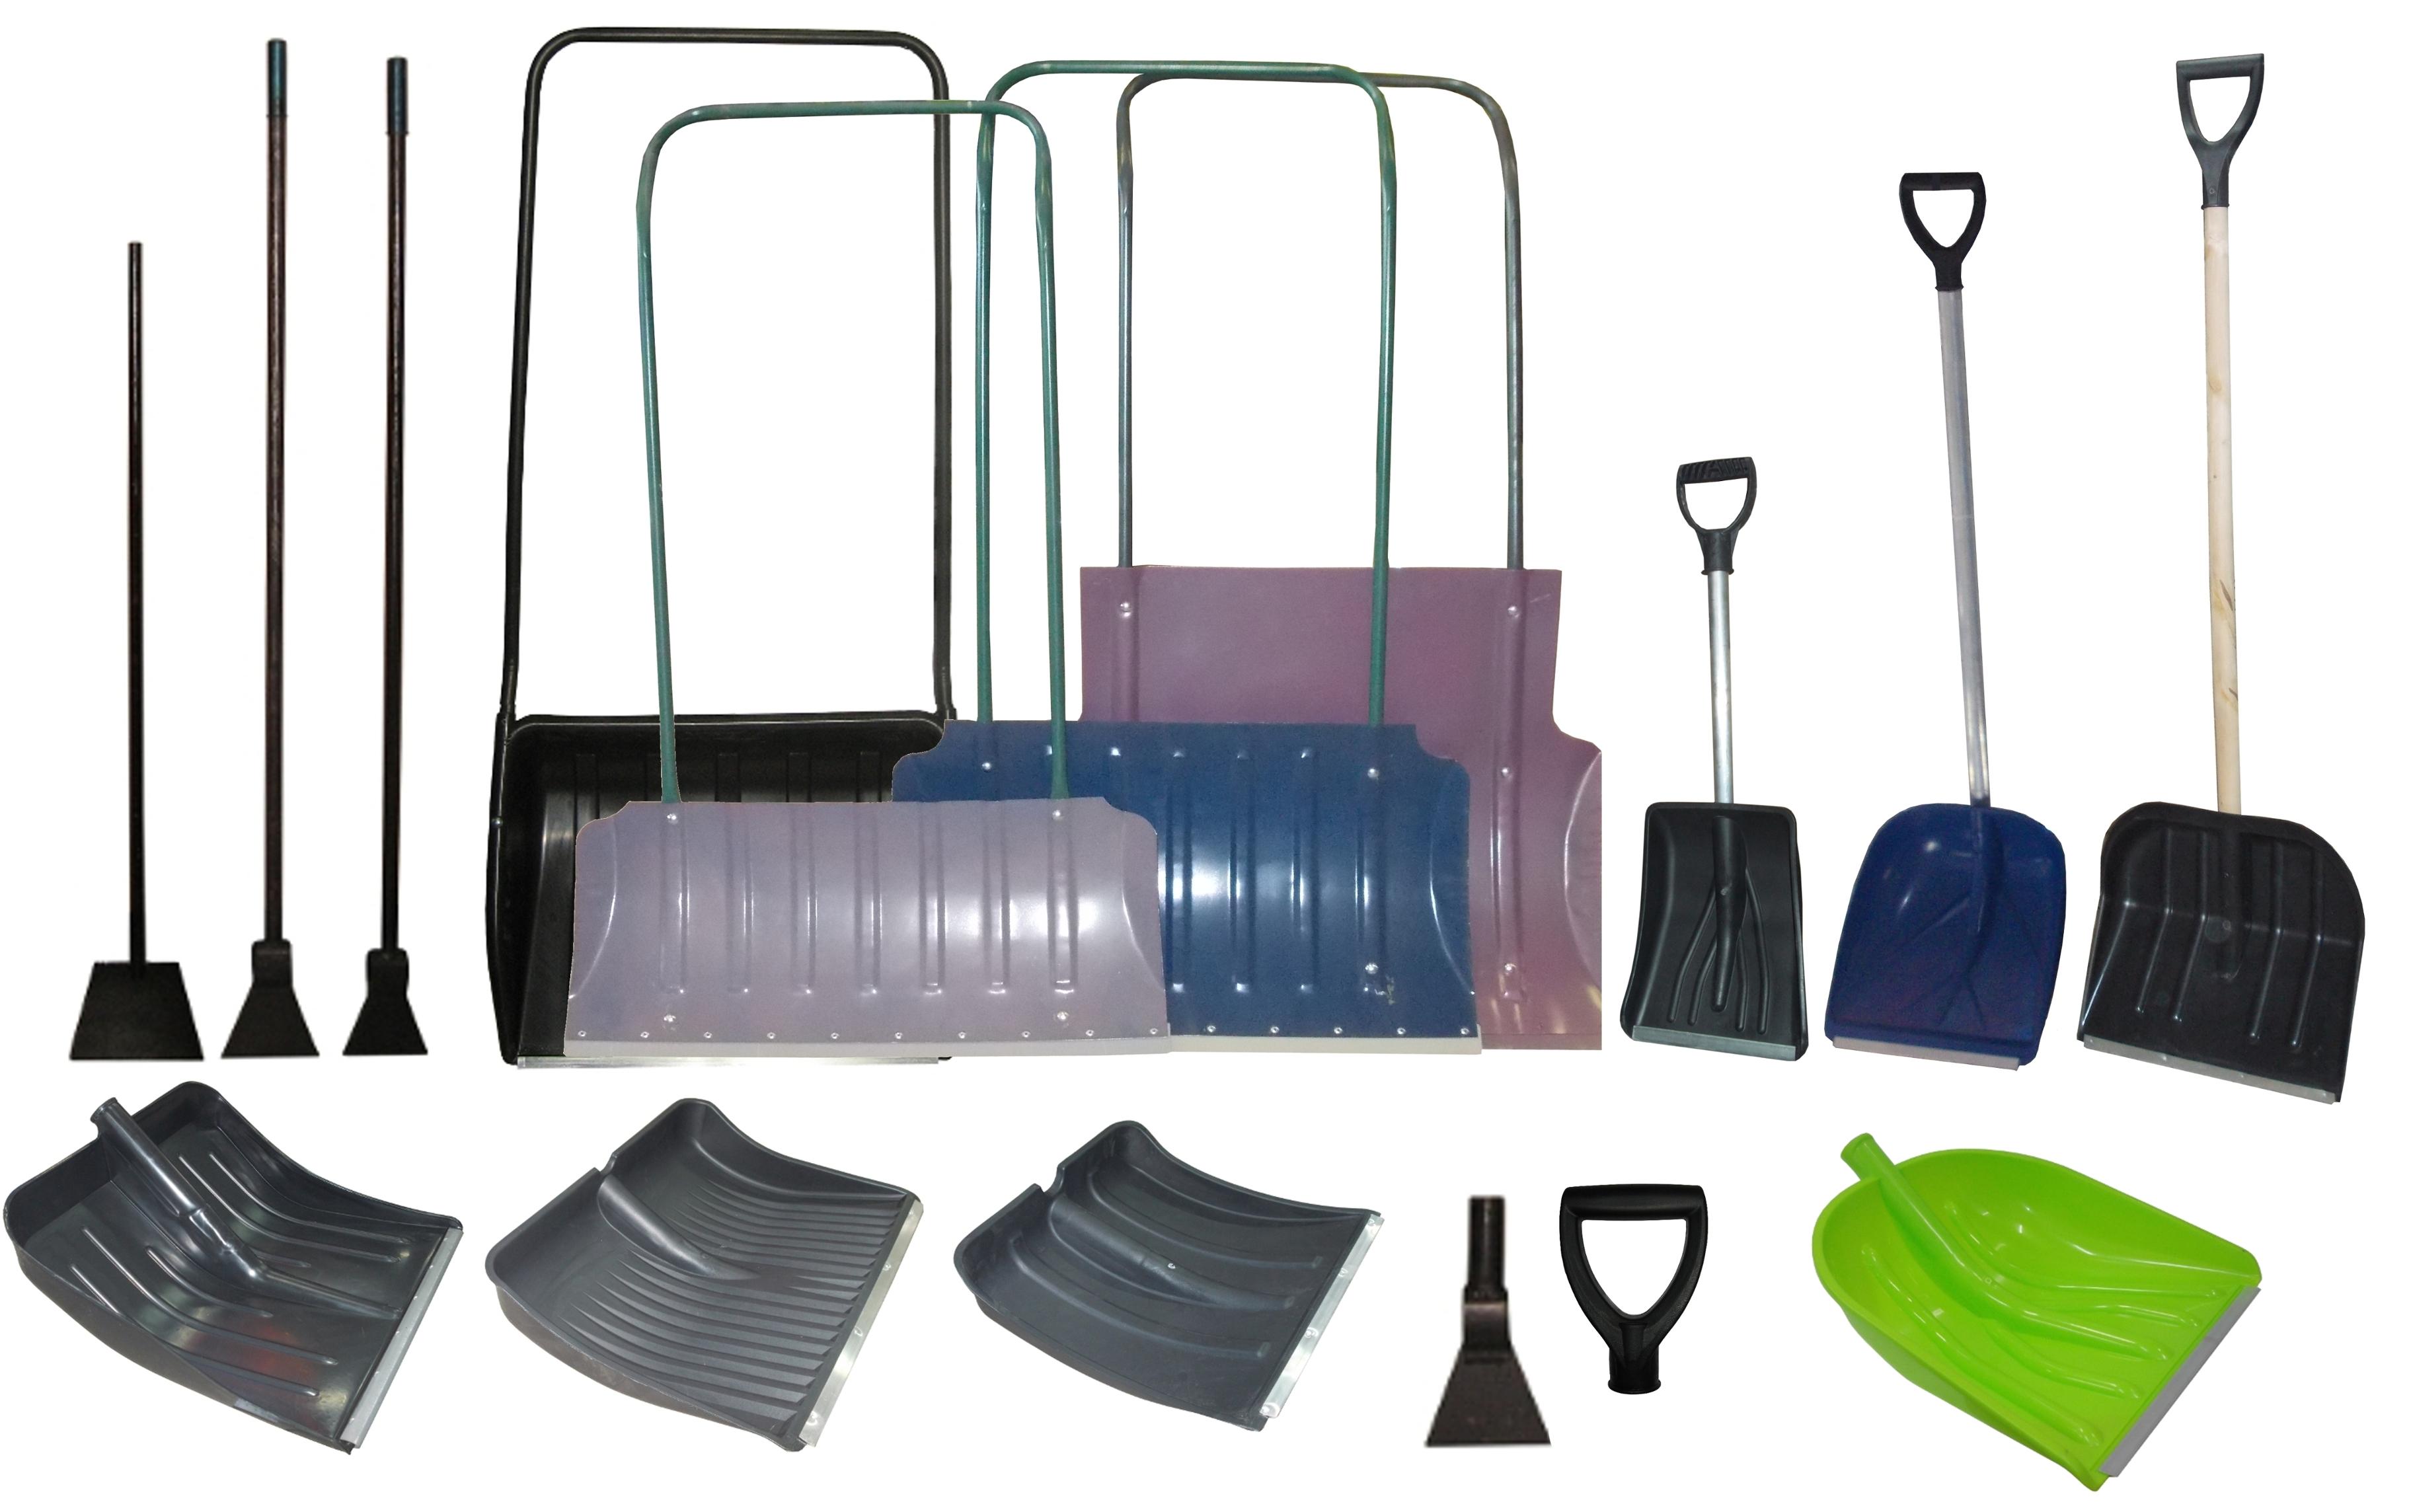 Лопата для уборки снега, скребки для быстрой чистки территории 61